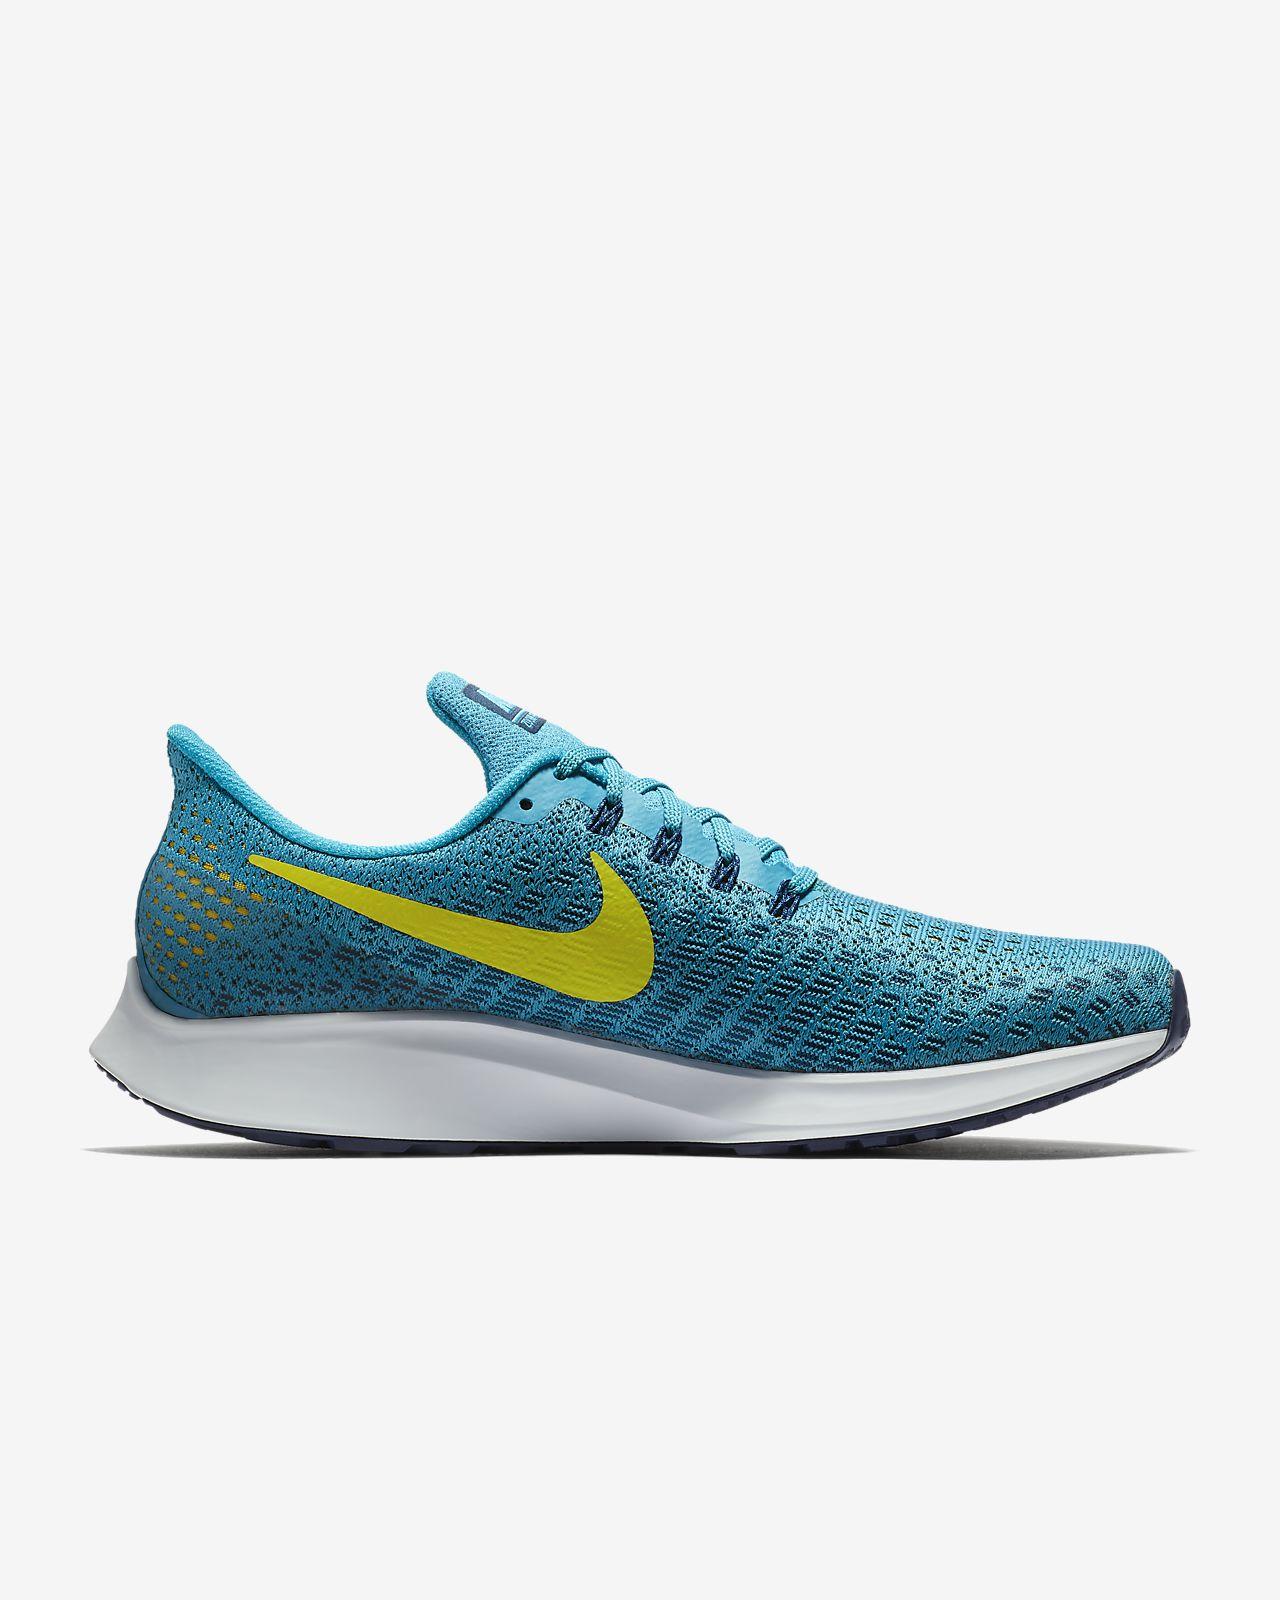 Nike Air Zoom Pegasus 34, Chaussures de Running Homme, Gris (Platine Pur/Gris Froid/Noir/Anthracite), 44 EU